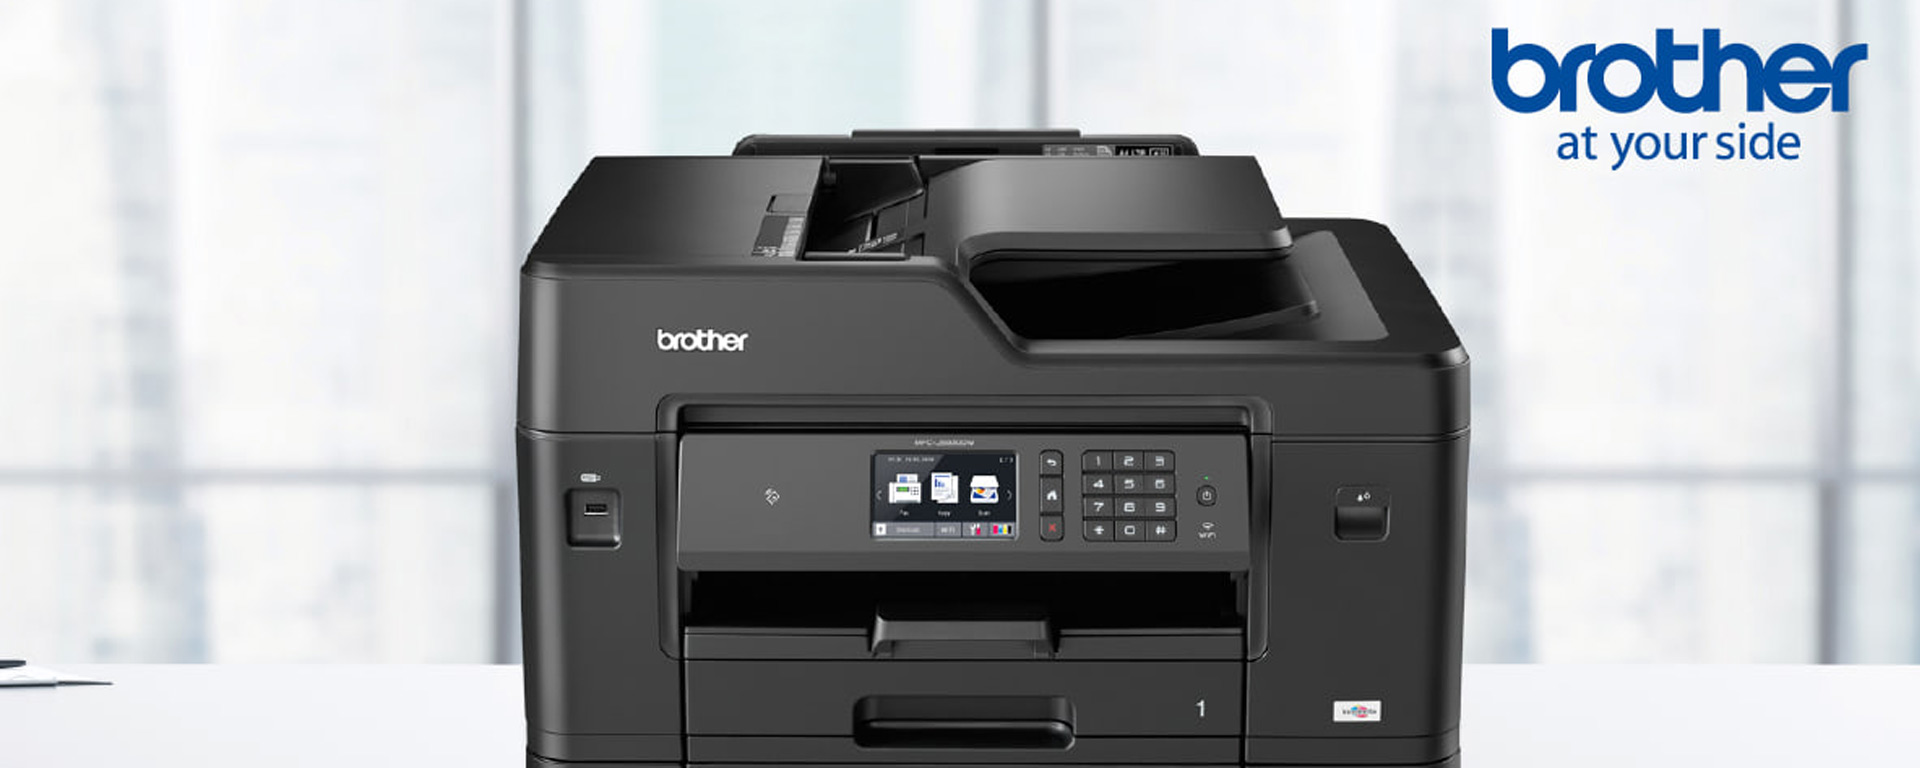 brother-printers-harvey-norman